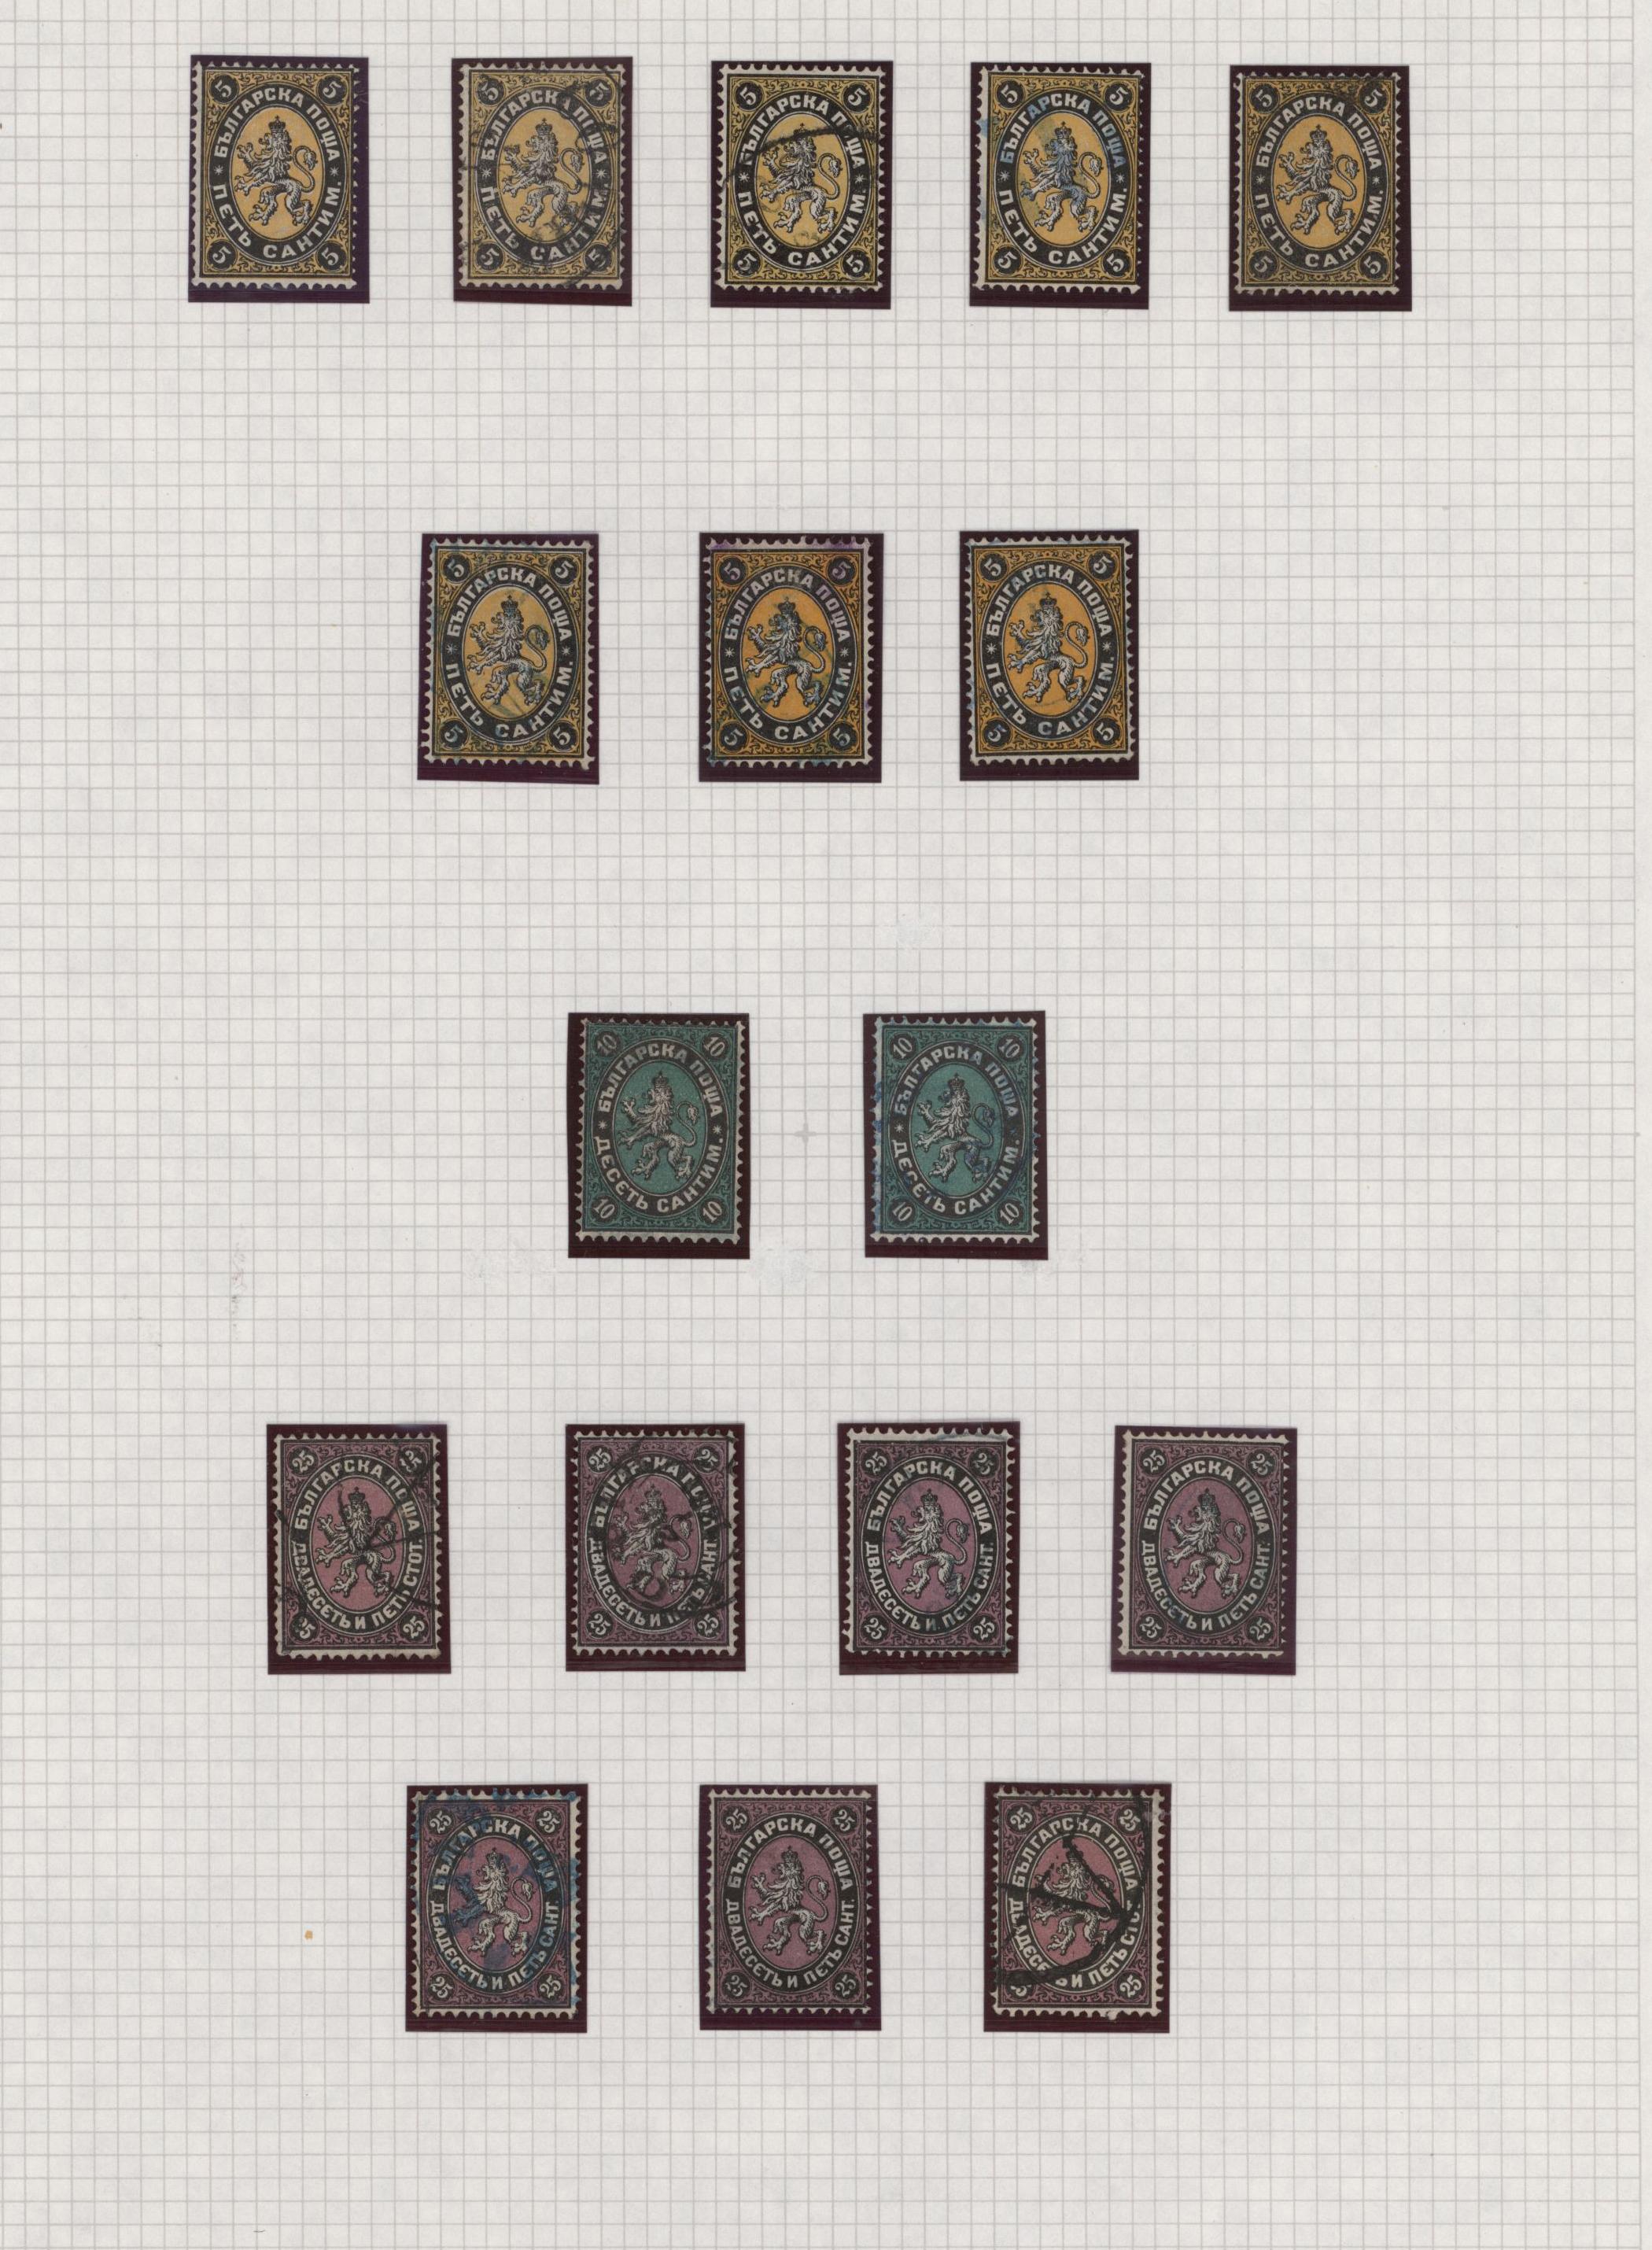 Lot 23754 - bulgarien  -  Auktionshaus Christoph Gärtner GmbH & Co. KG Sale #46 Collections Worldwide